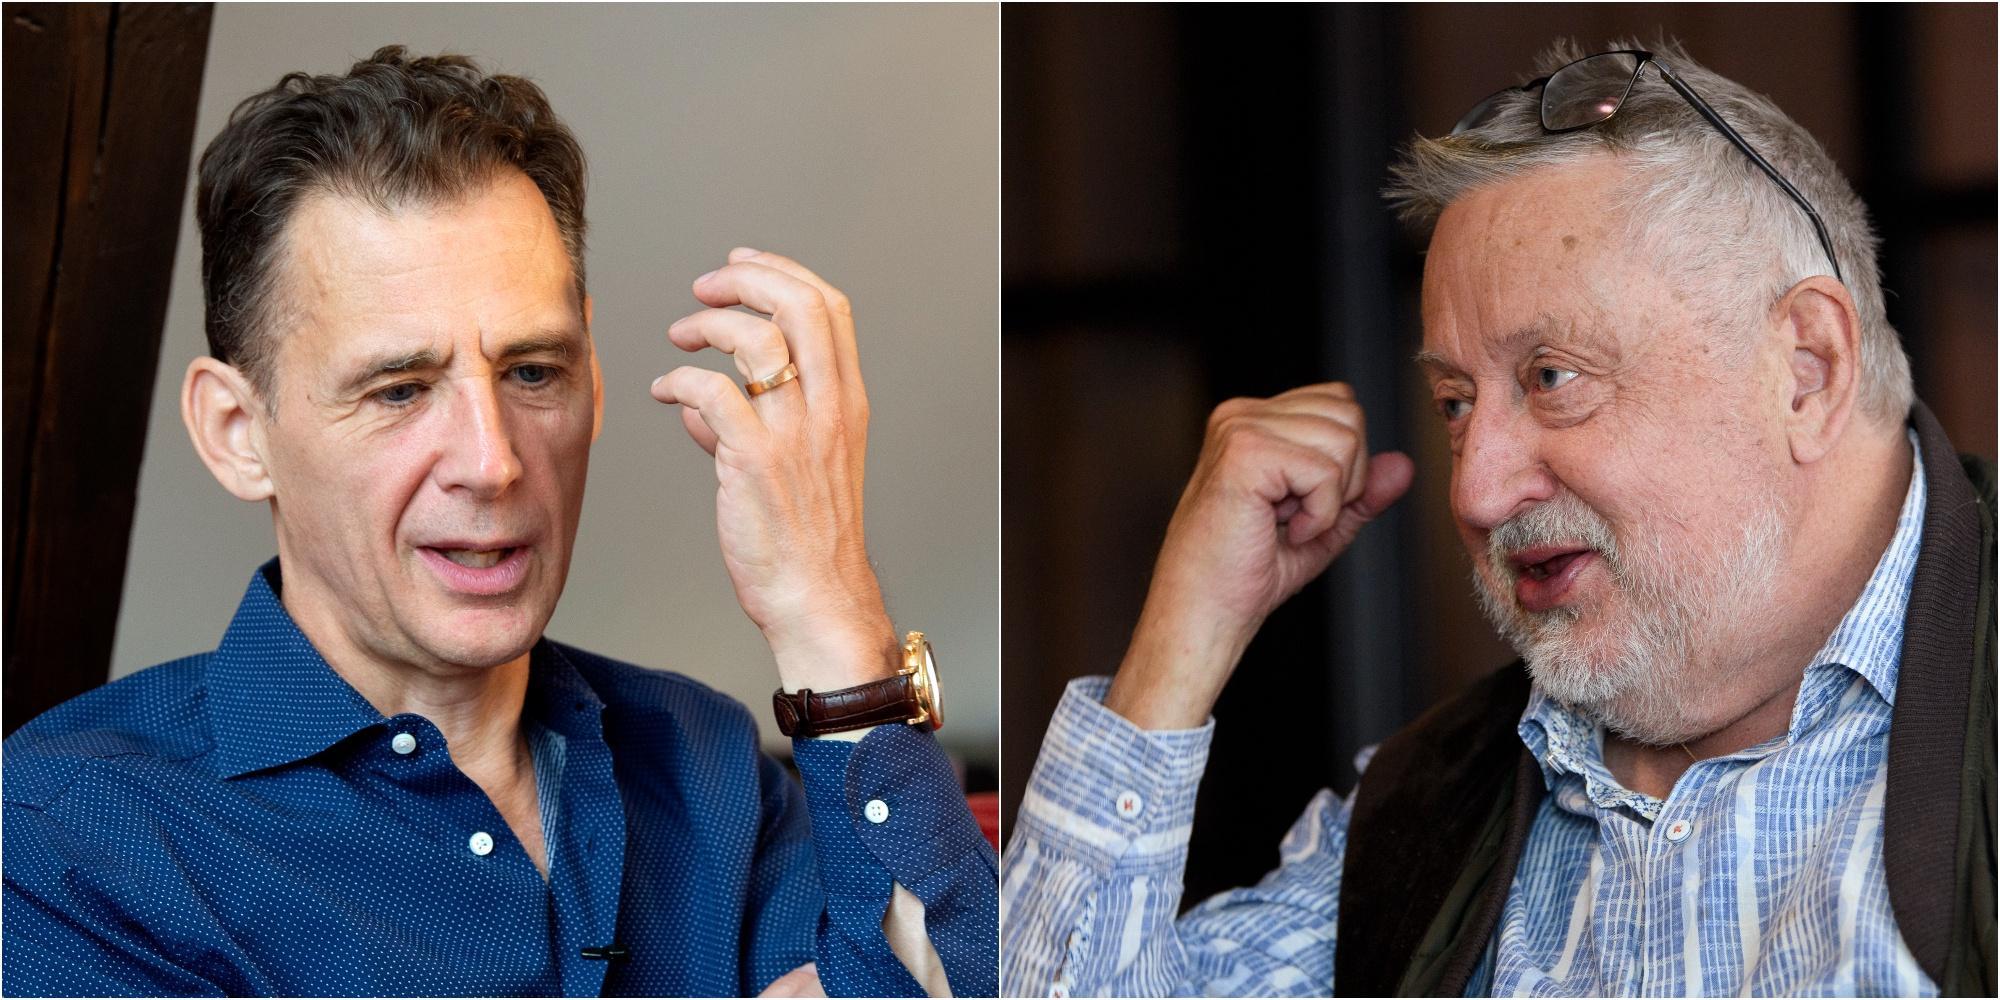 Leif GW Persson och David Lagercrantz i bråk